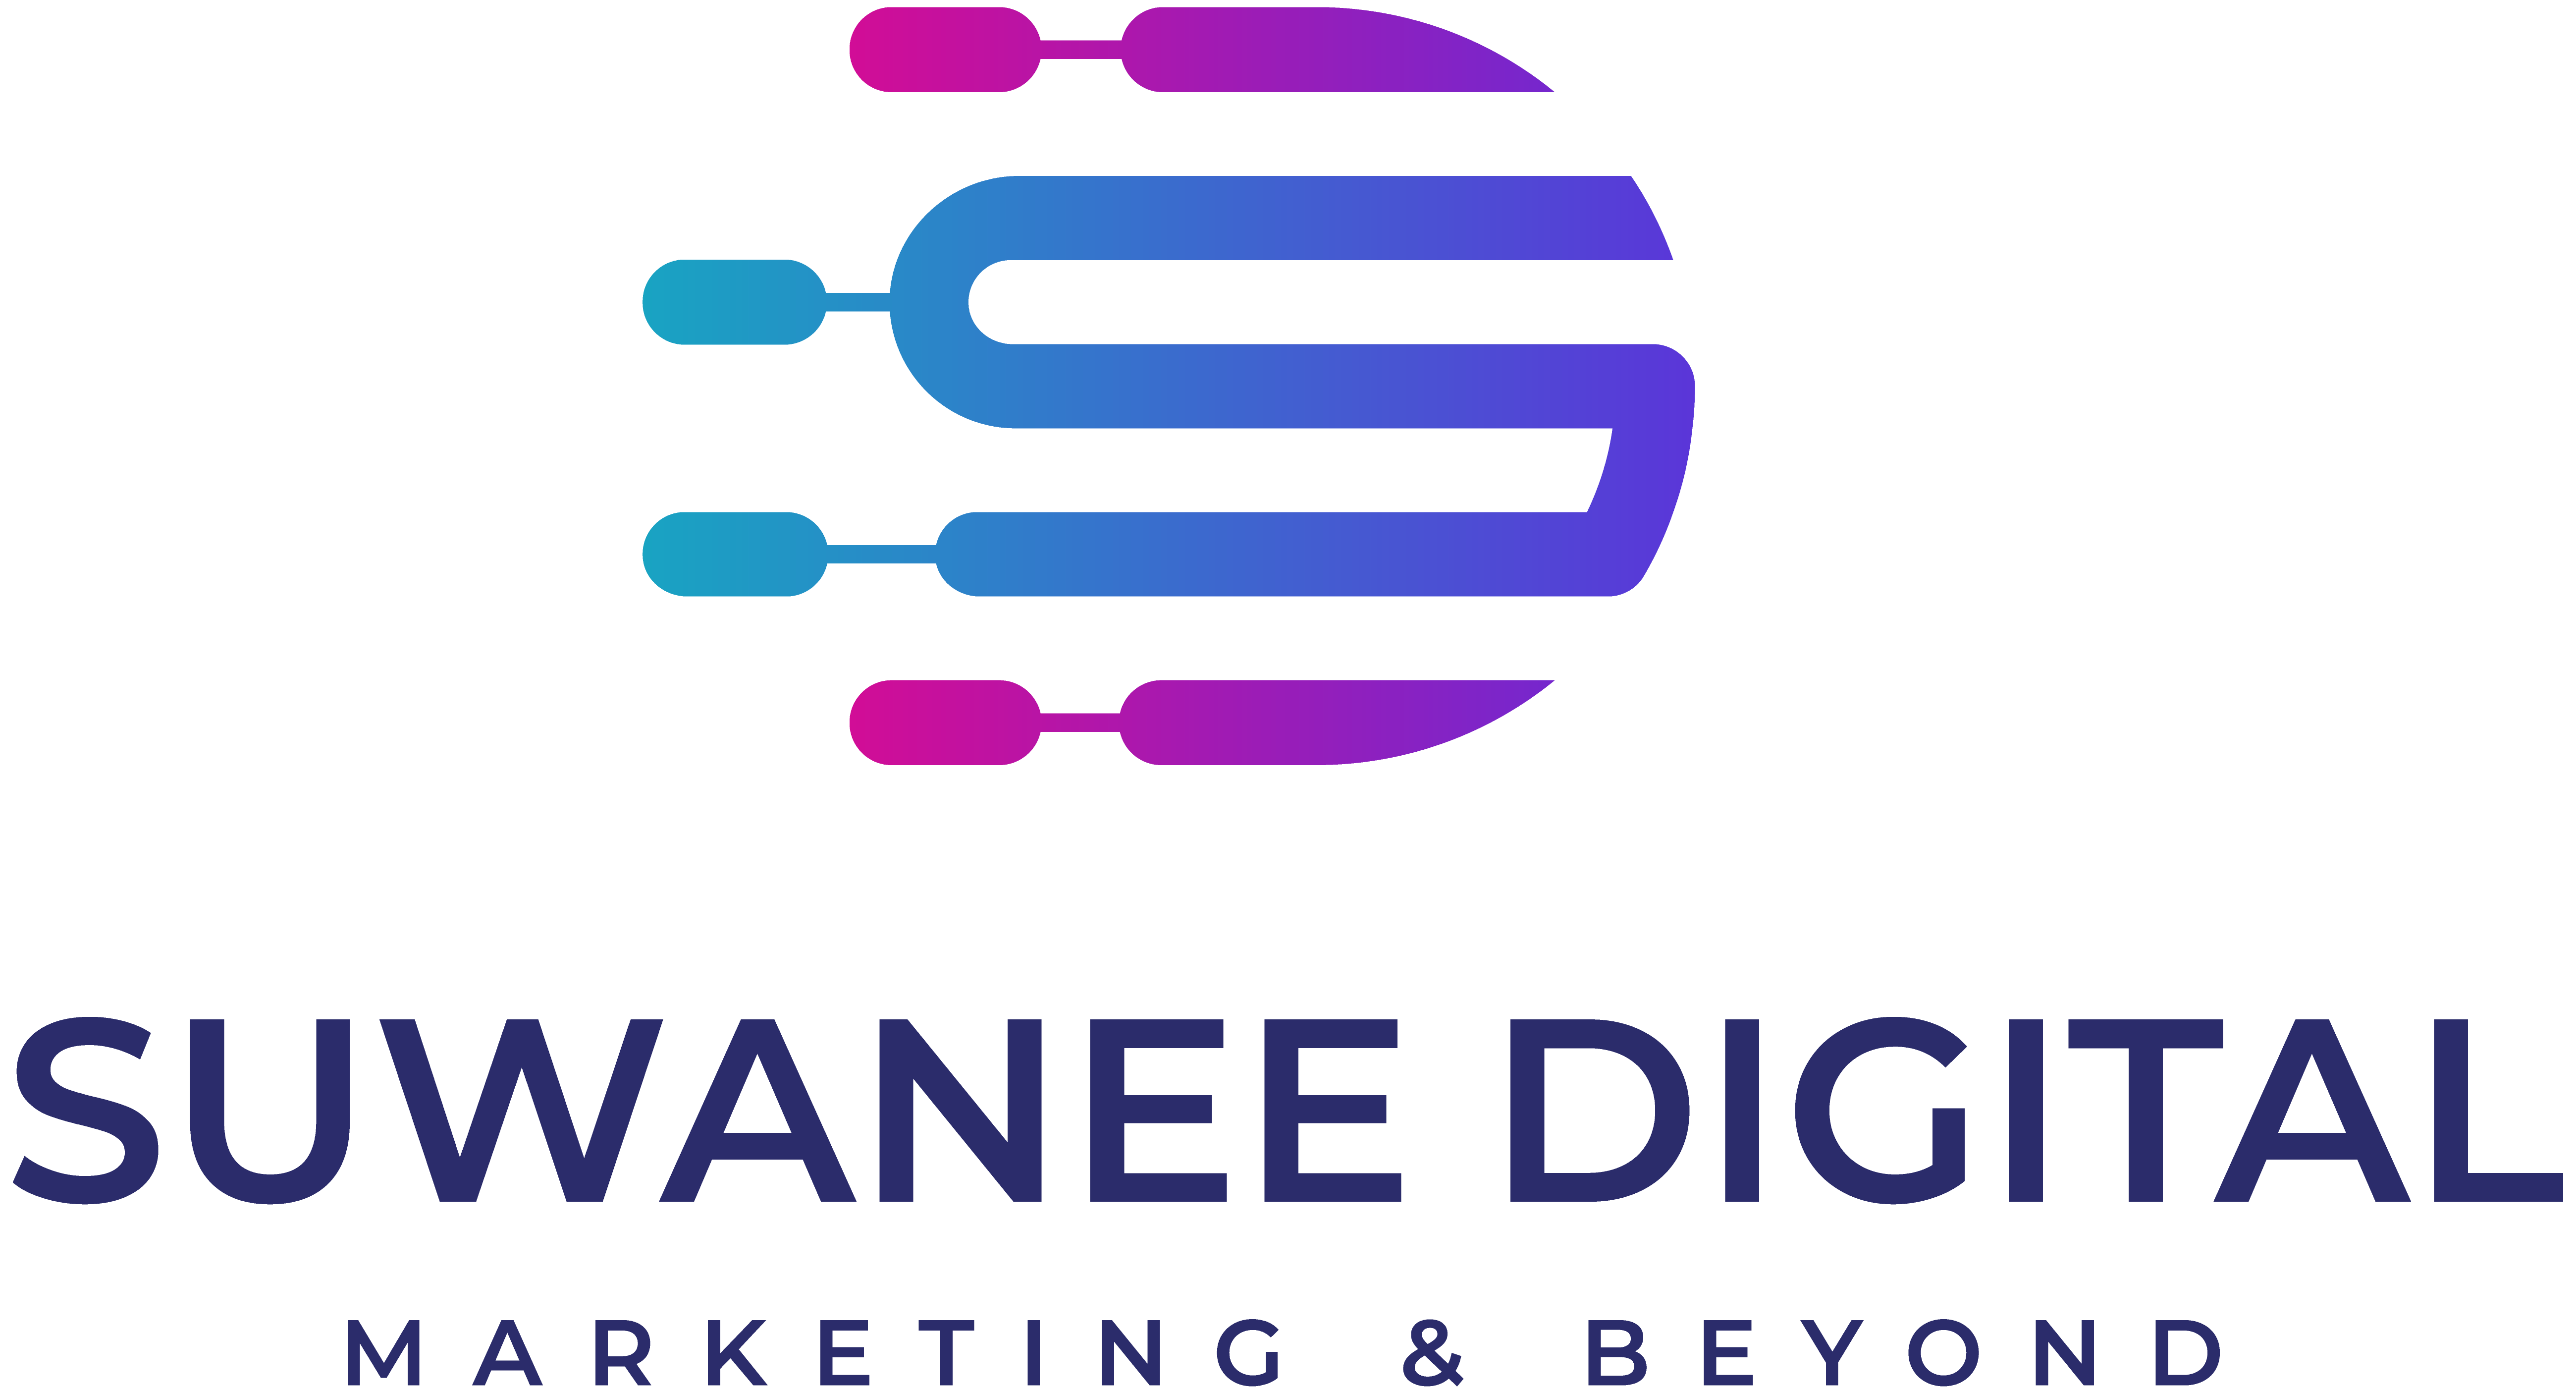 Suwanee Digital Logo